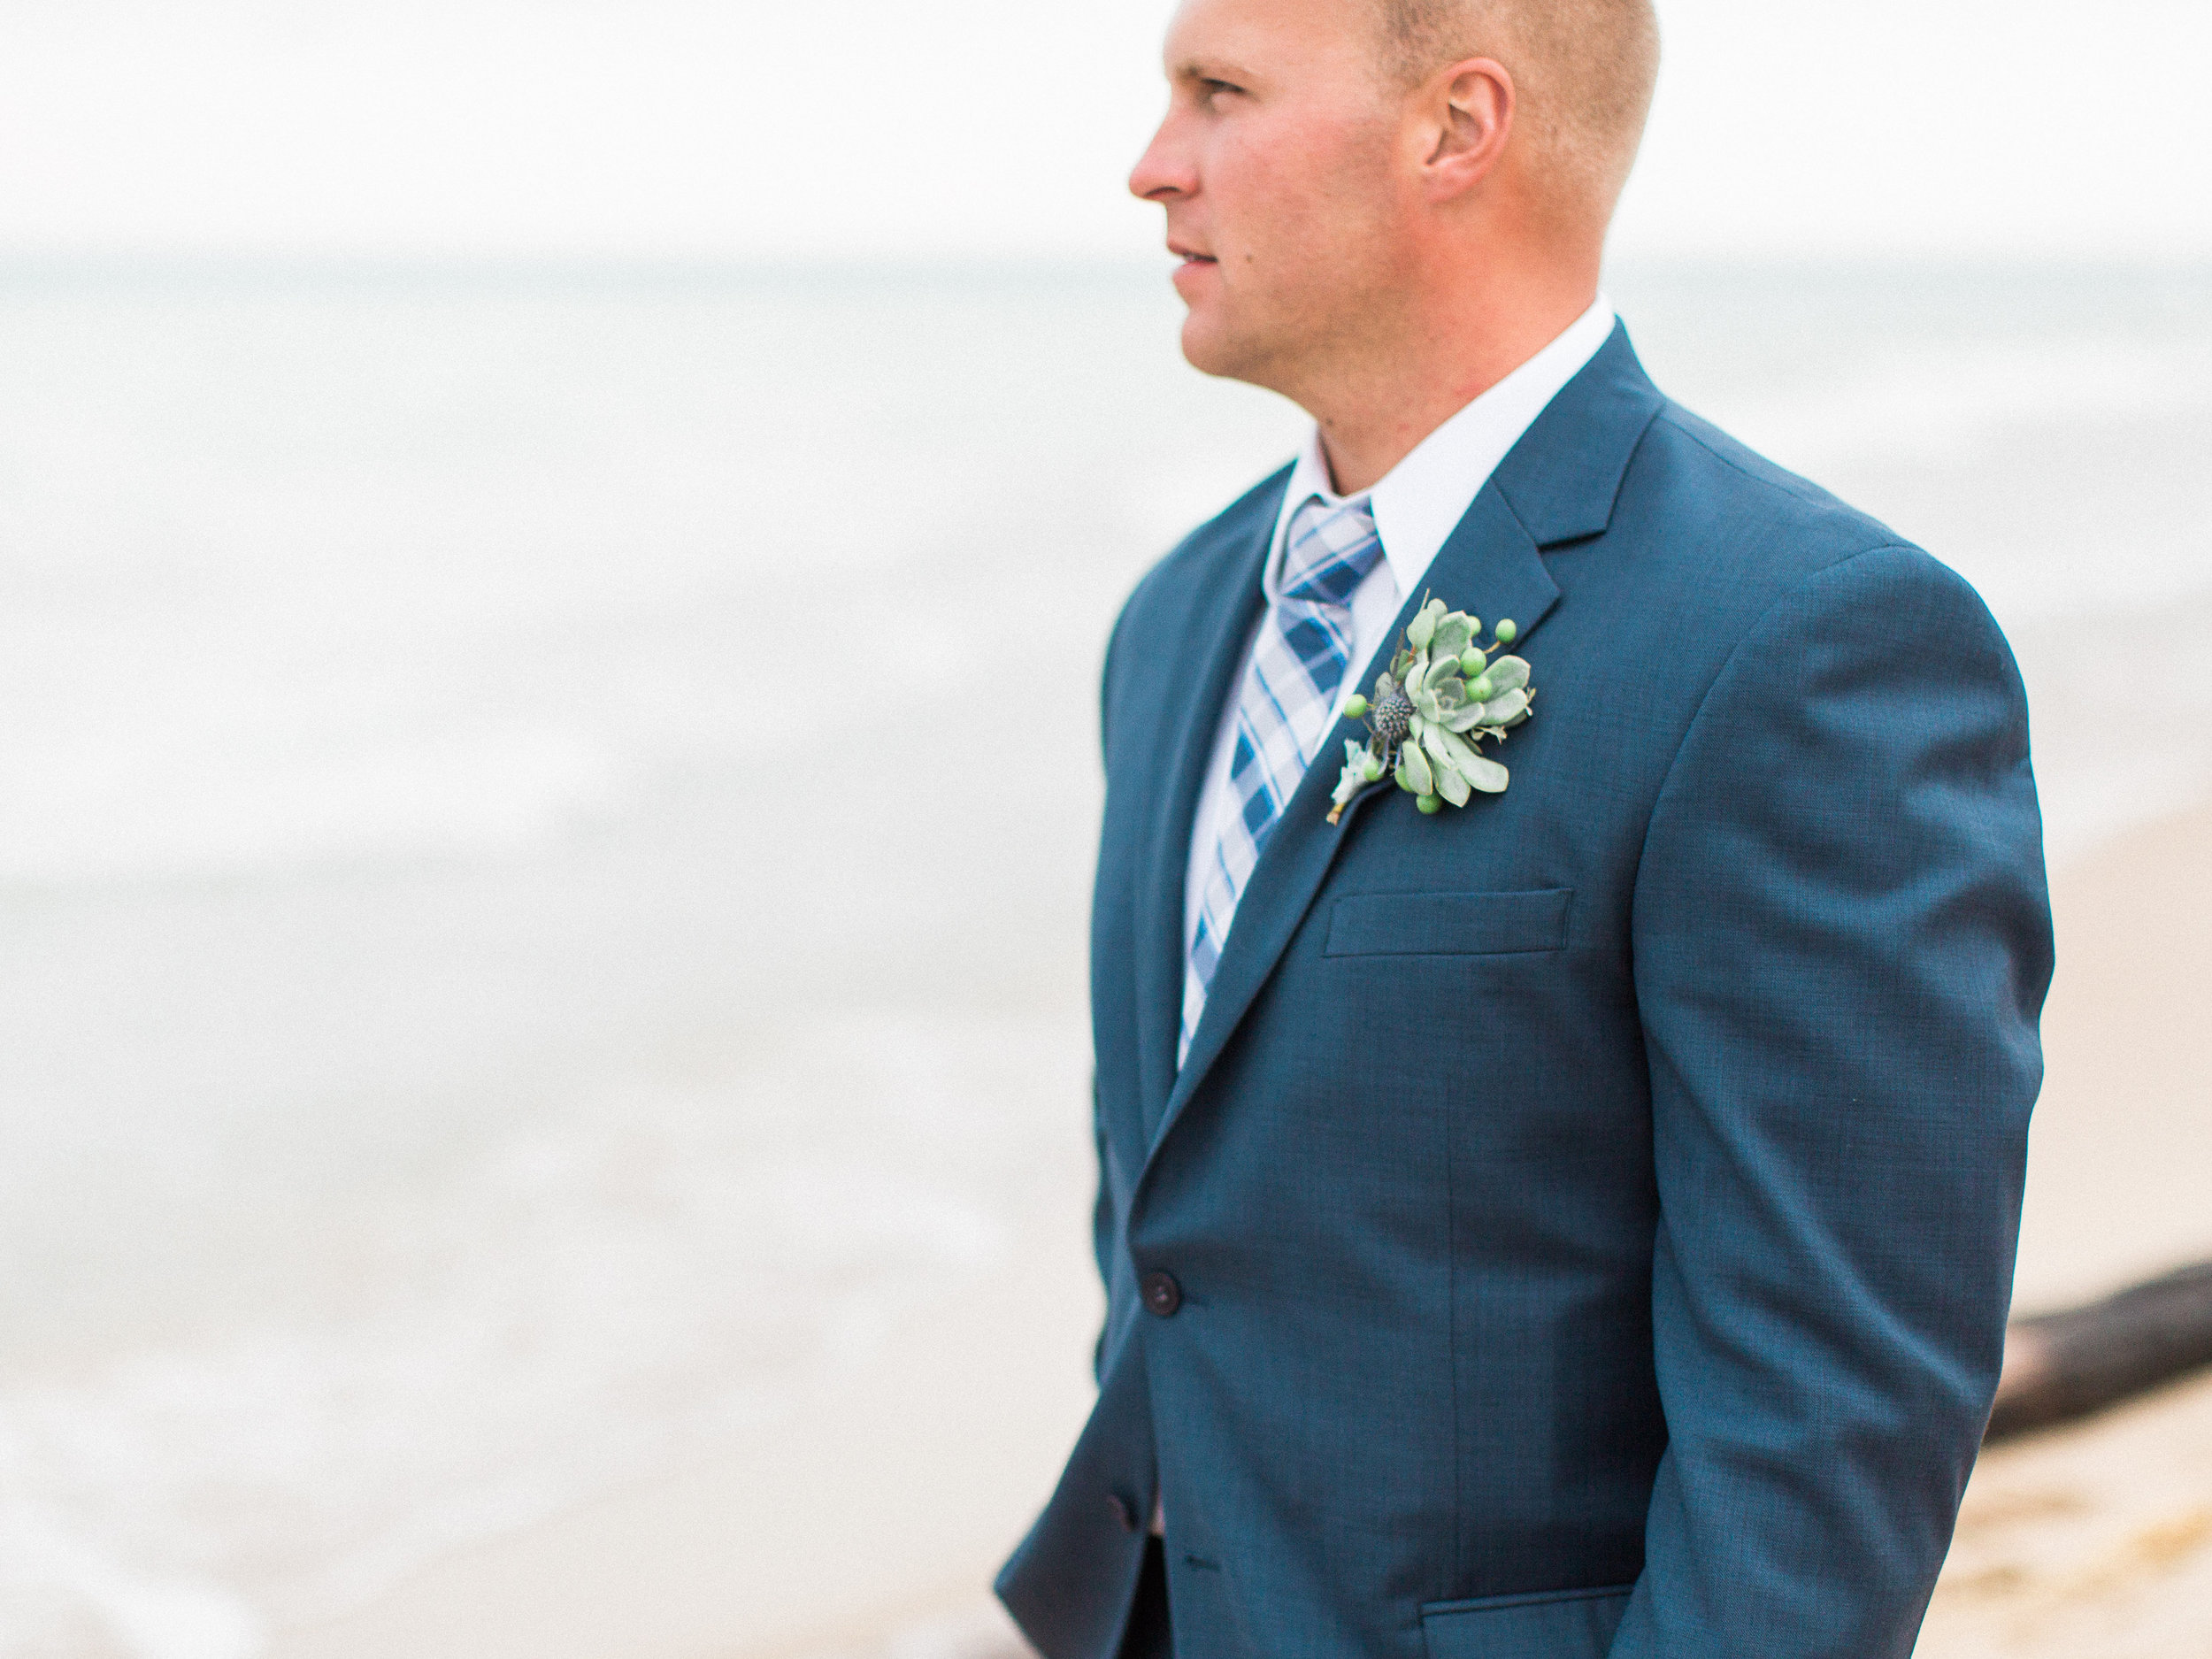 ERIC AND HALLIE WEDDING-HI RESOLUTION FOR PRINTING-0738.jpg